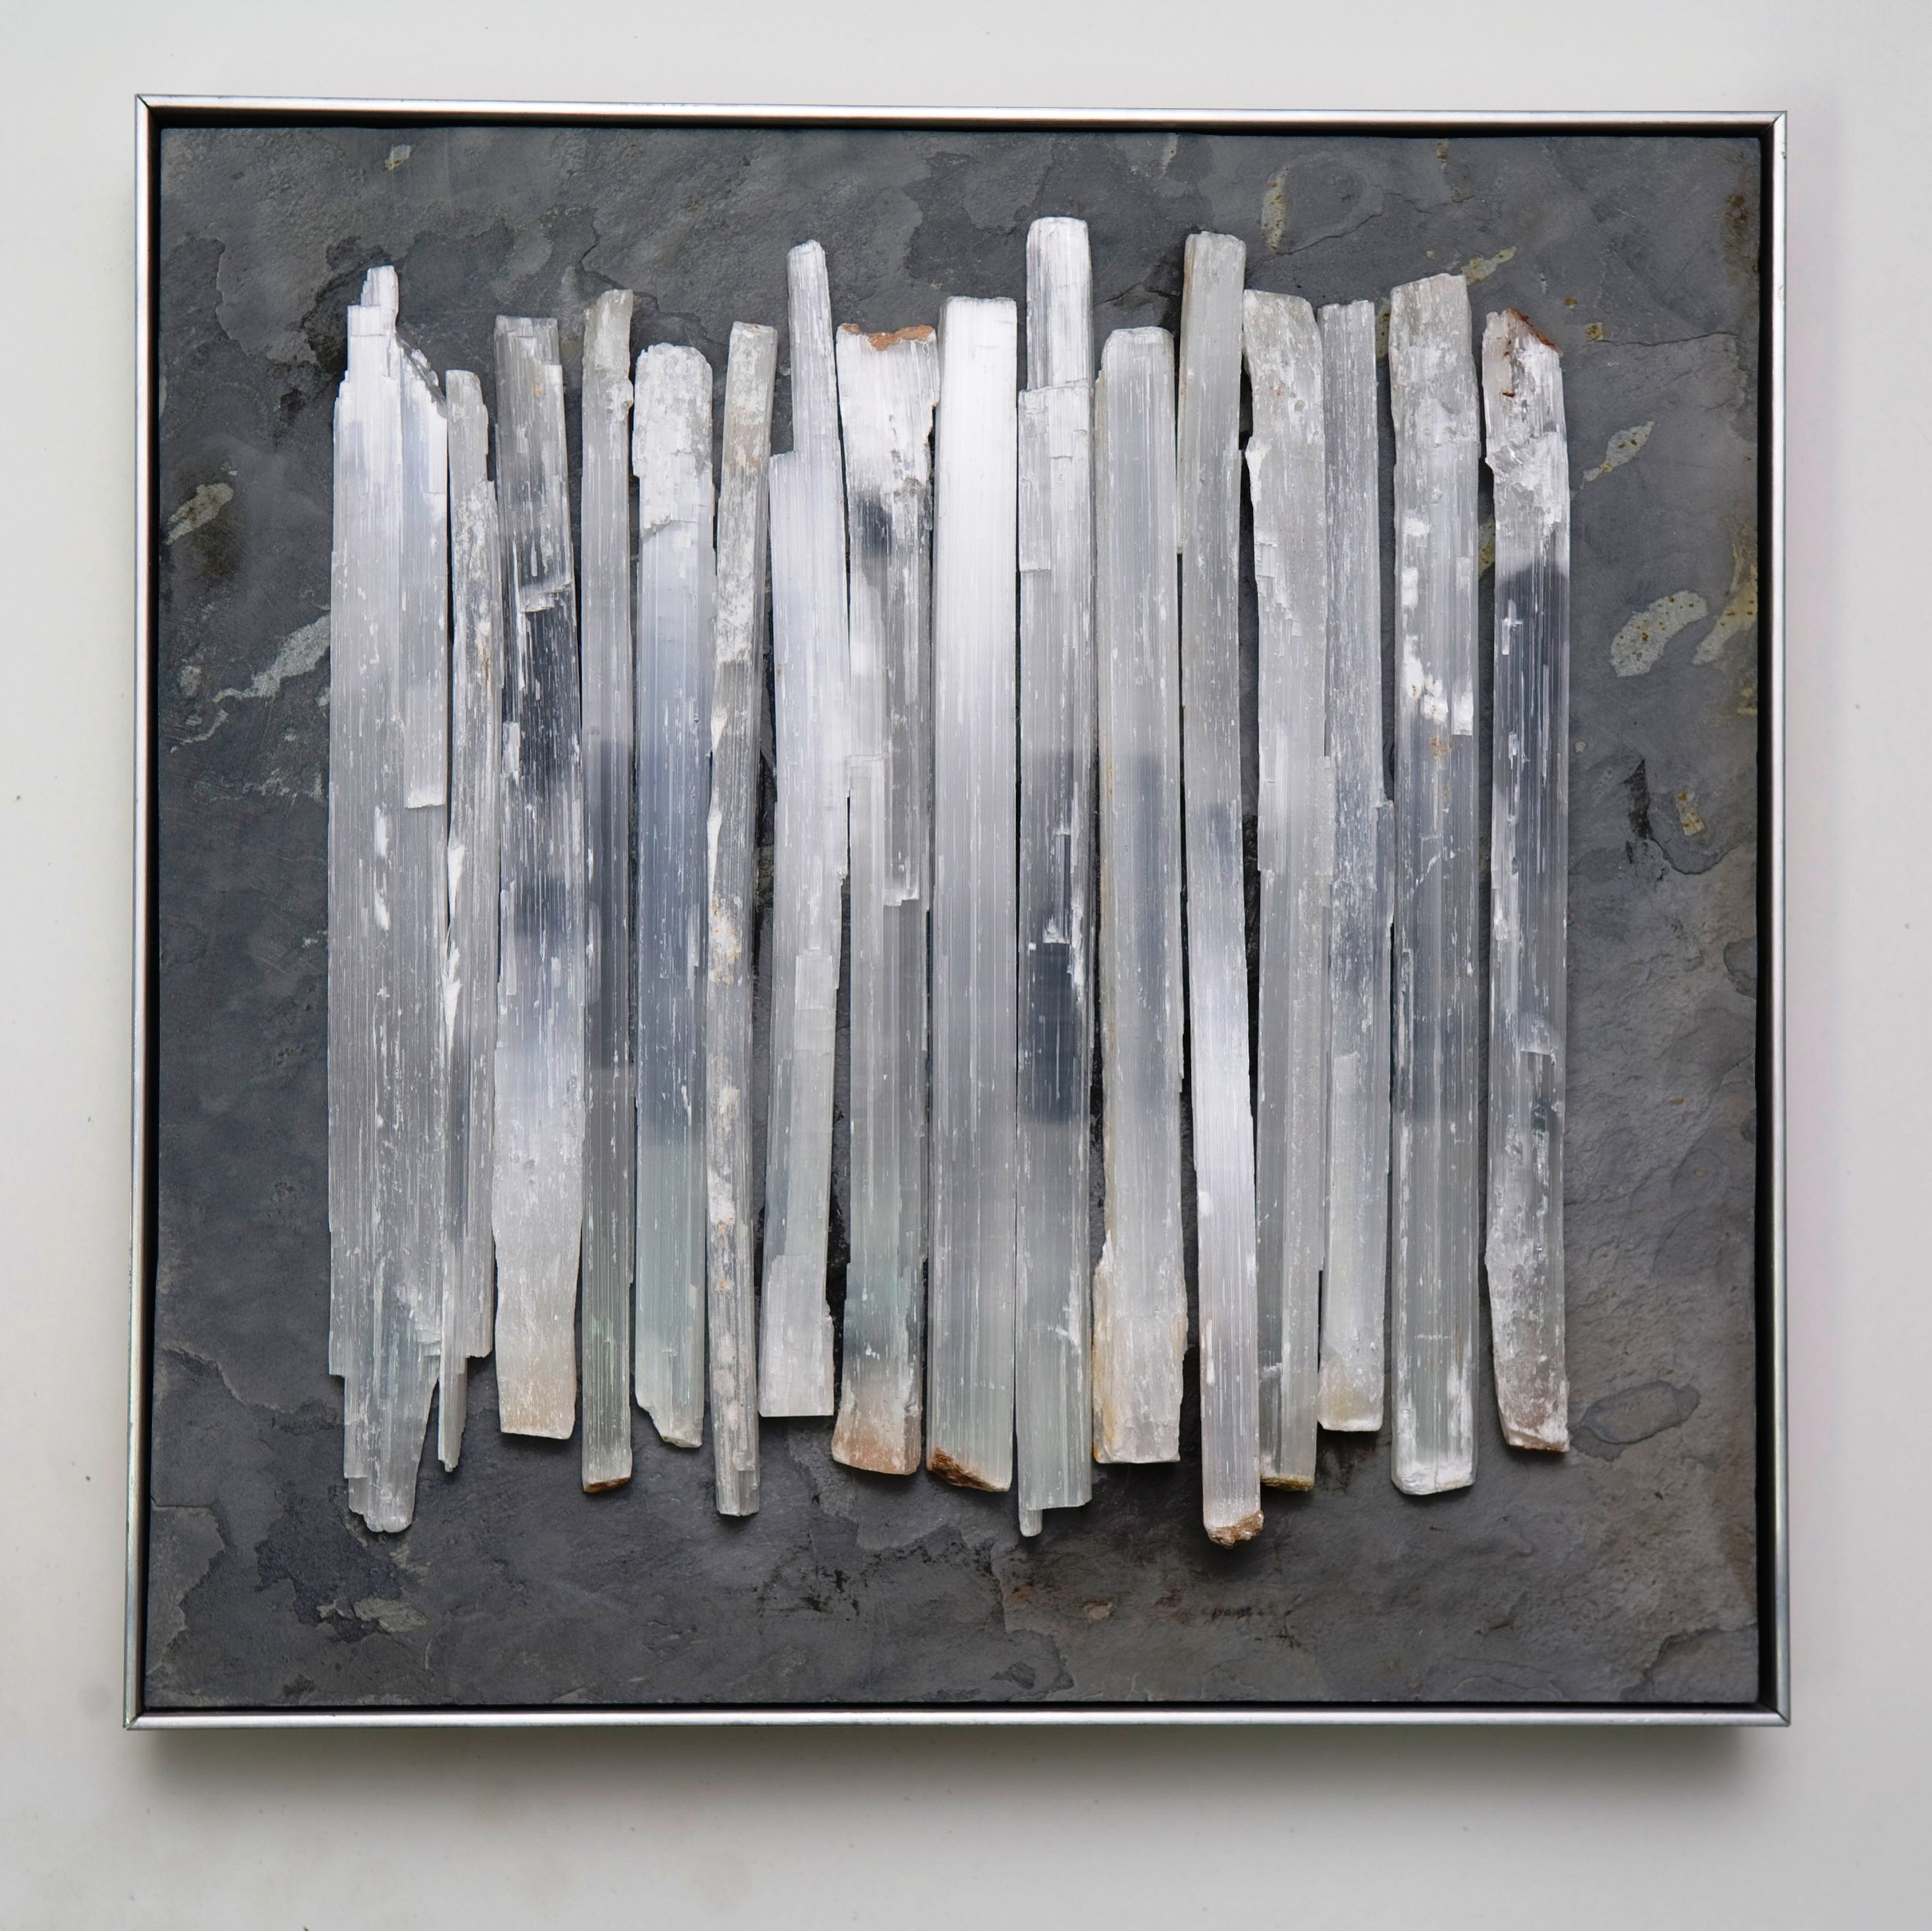 Sticks on Stone Wrubel_Chantilis_090625_048.jpg